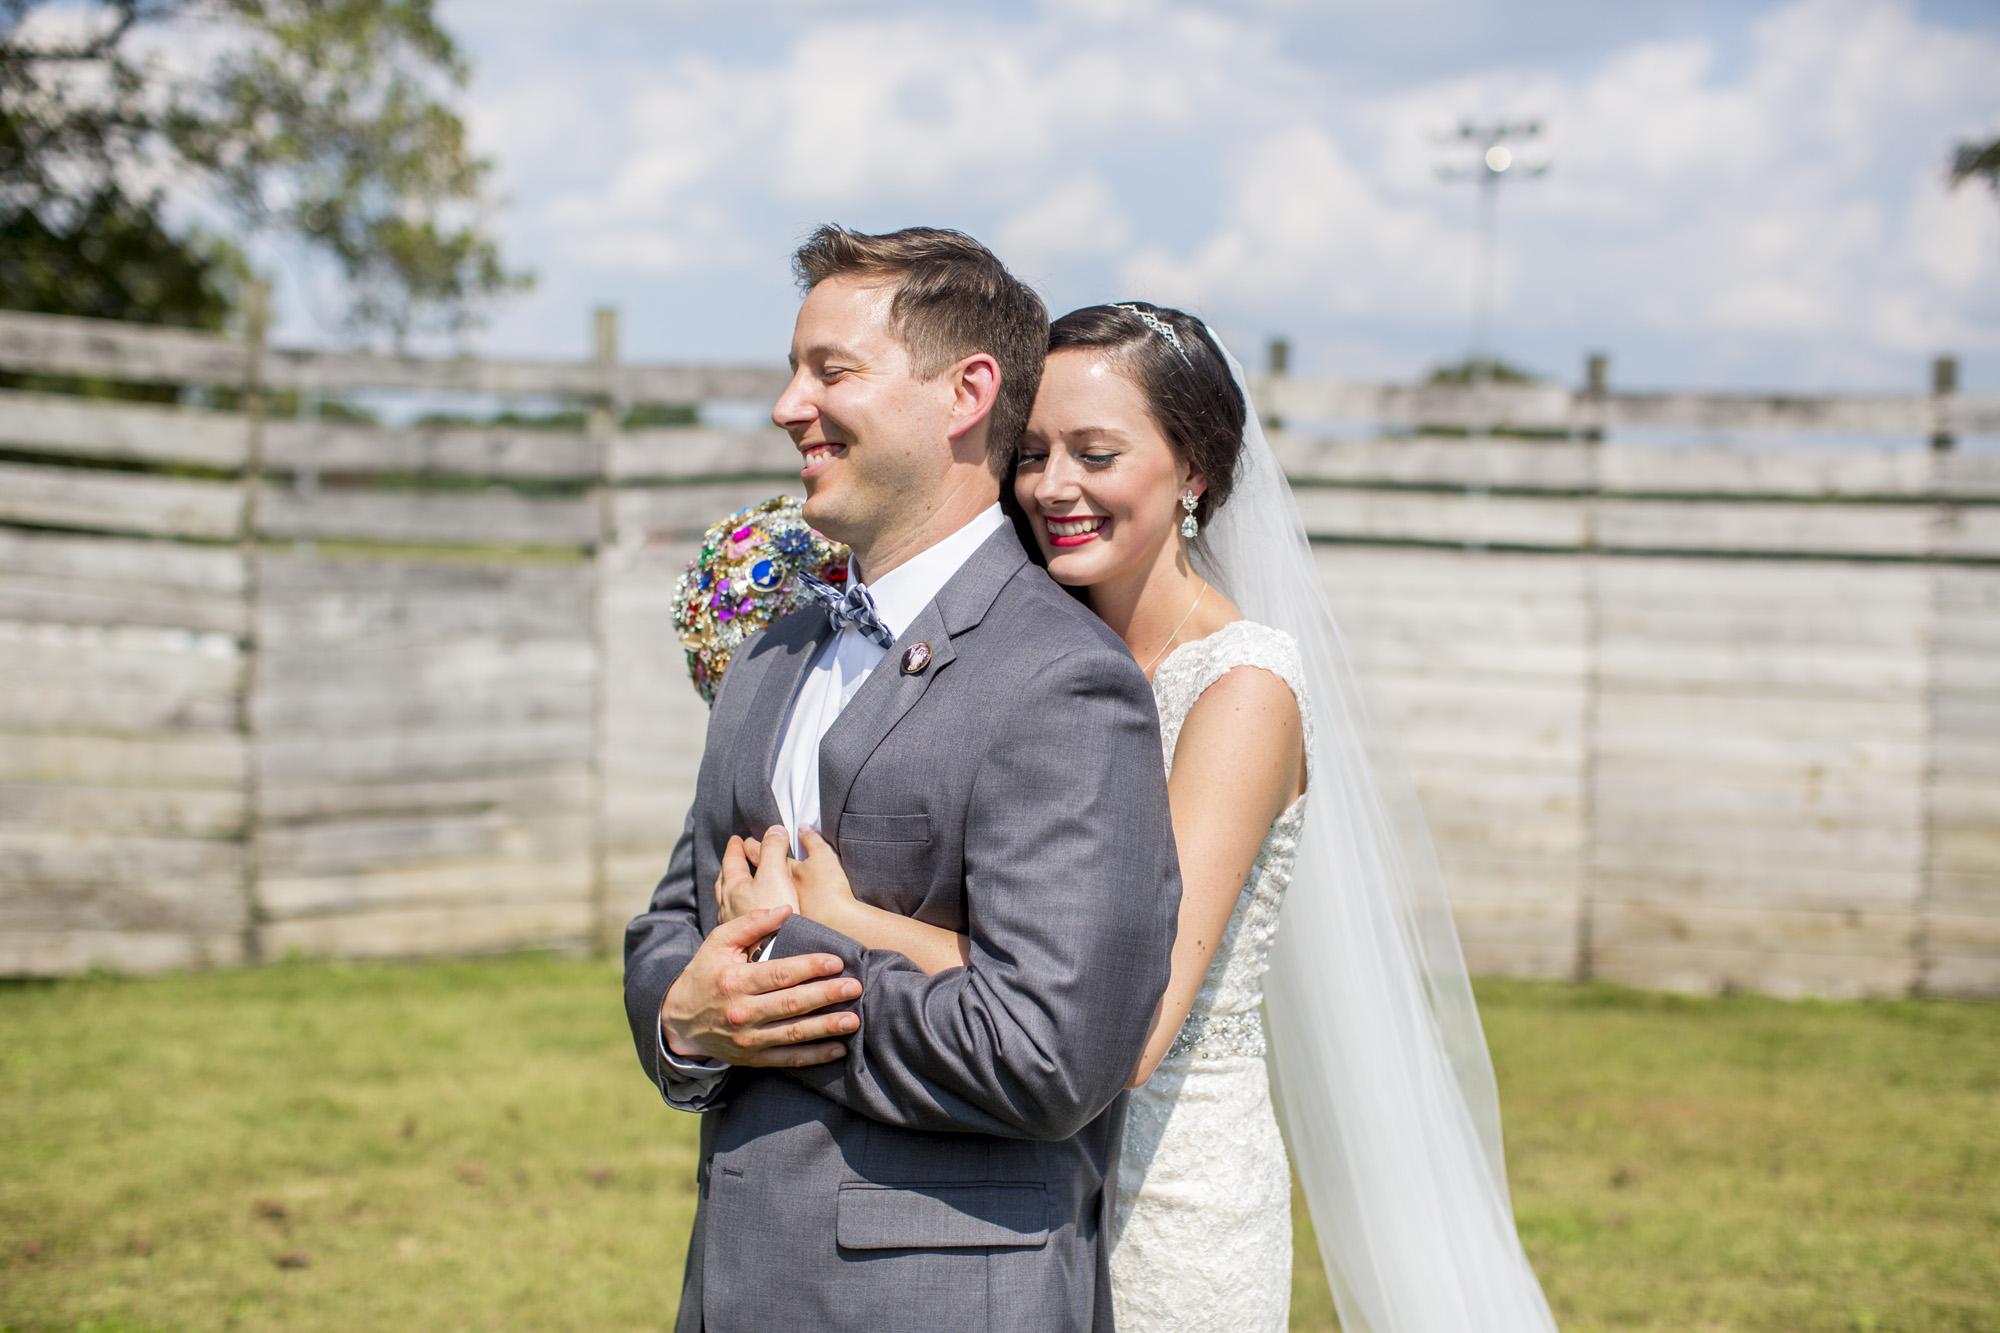 Seriously_Sabrina_Photography_Bowling_Green_Kentucky_Highland_Stables_Wedding_Wolff44.jpg